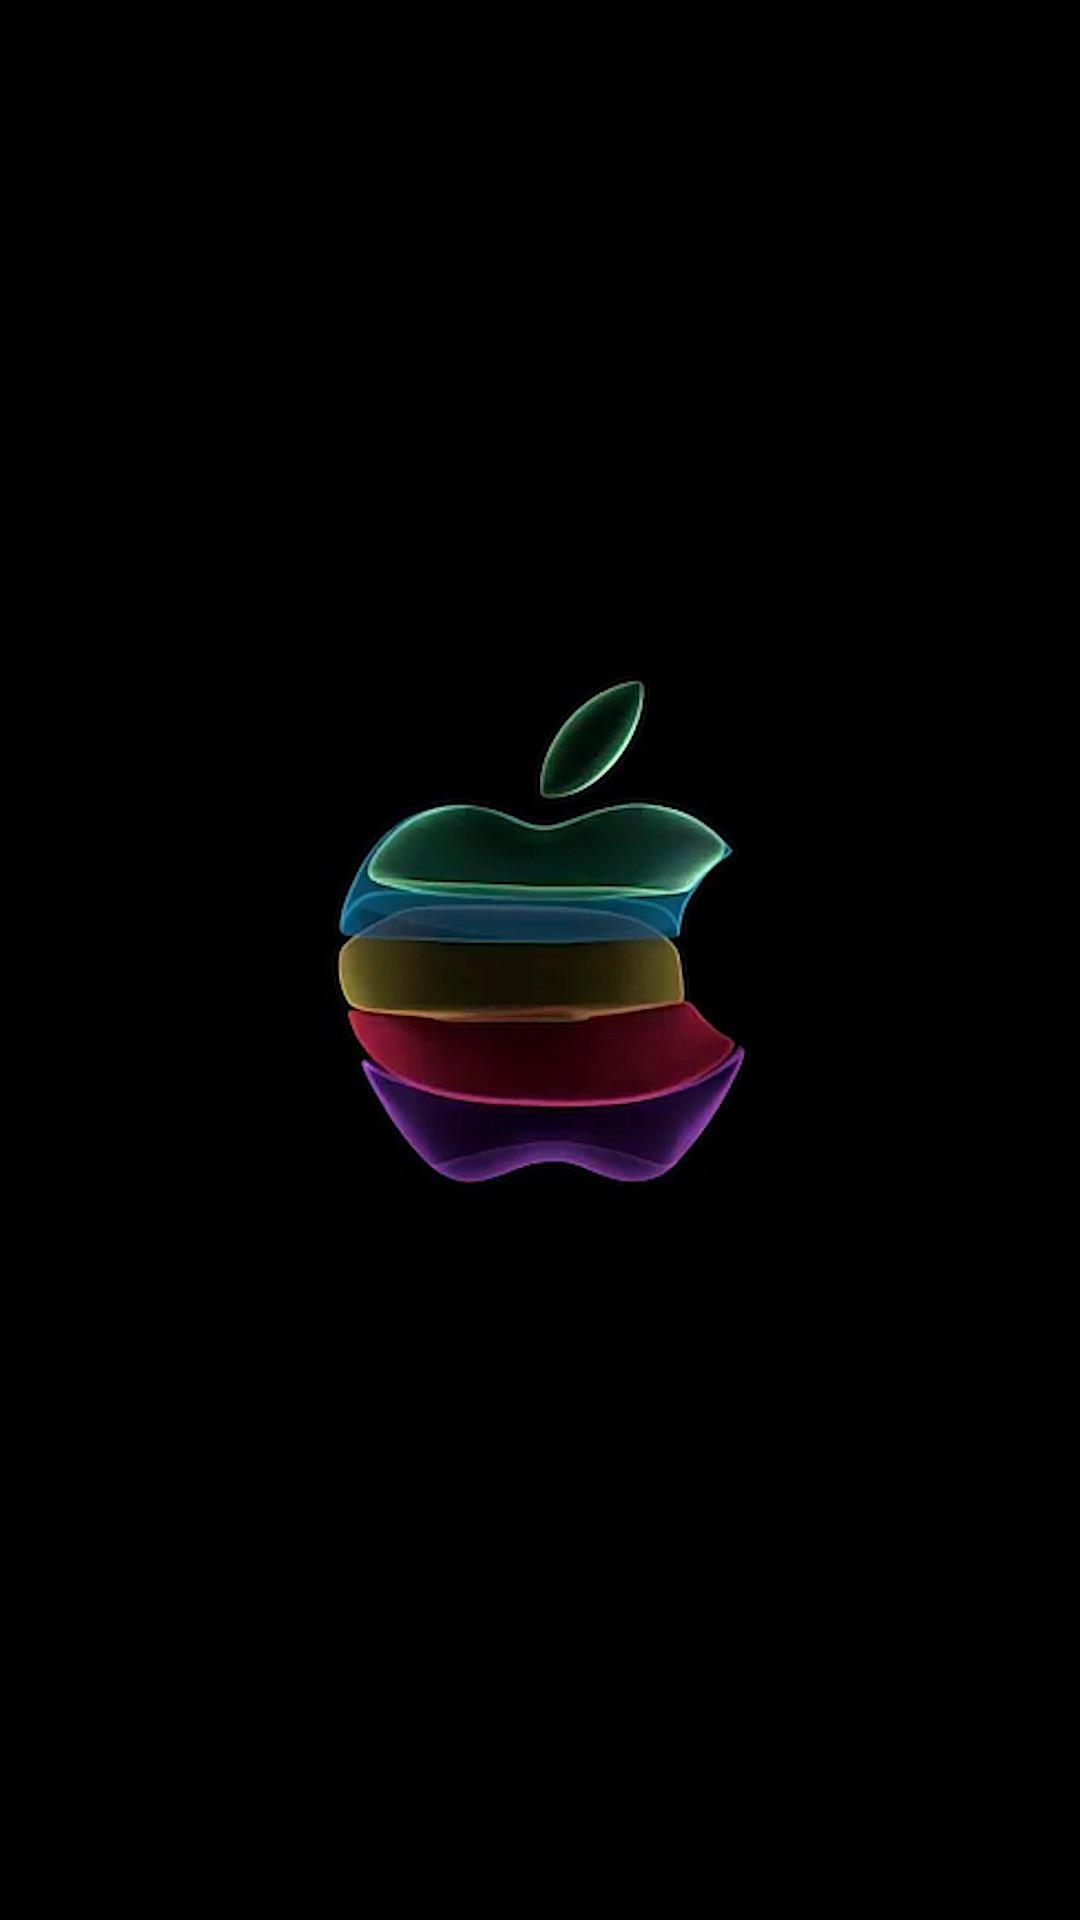 Apple Logo iPhone 11 Animation | LIVE Wallpaper ...